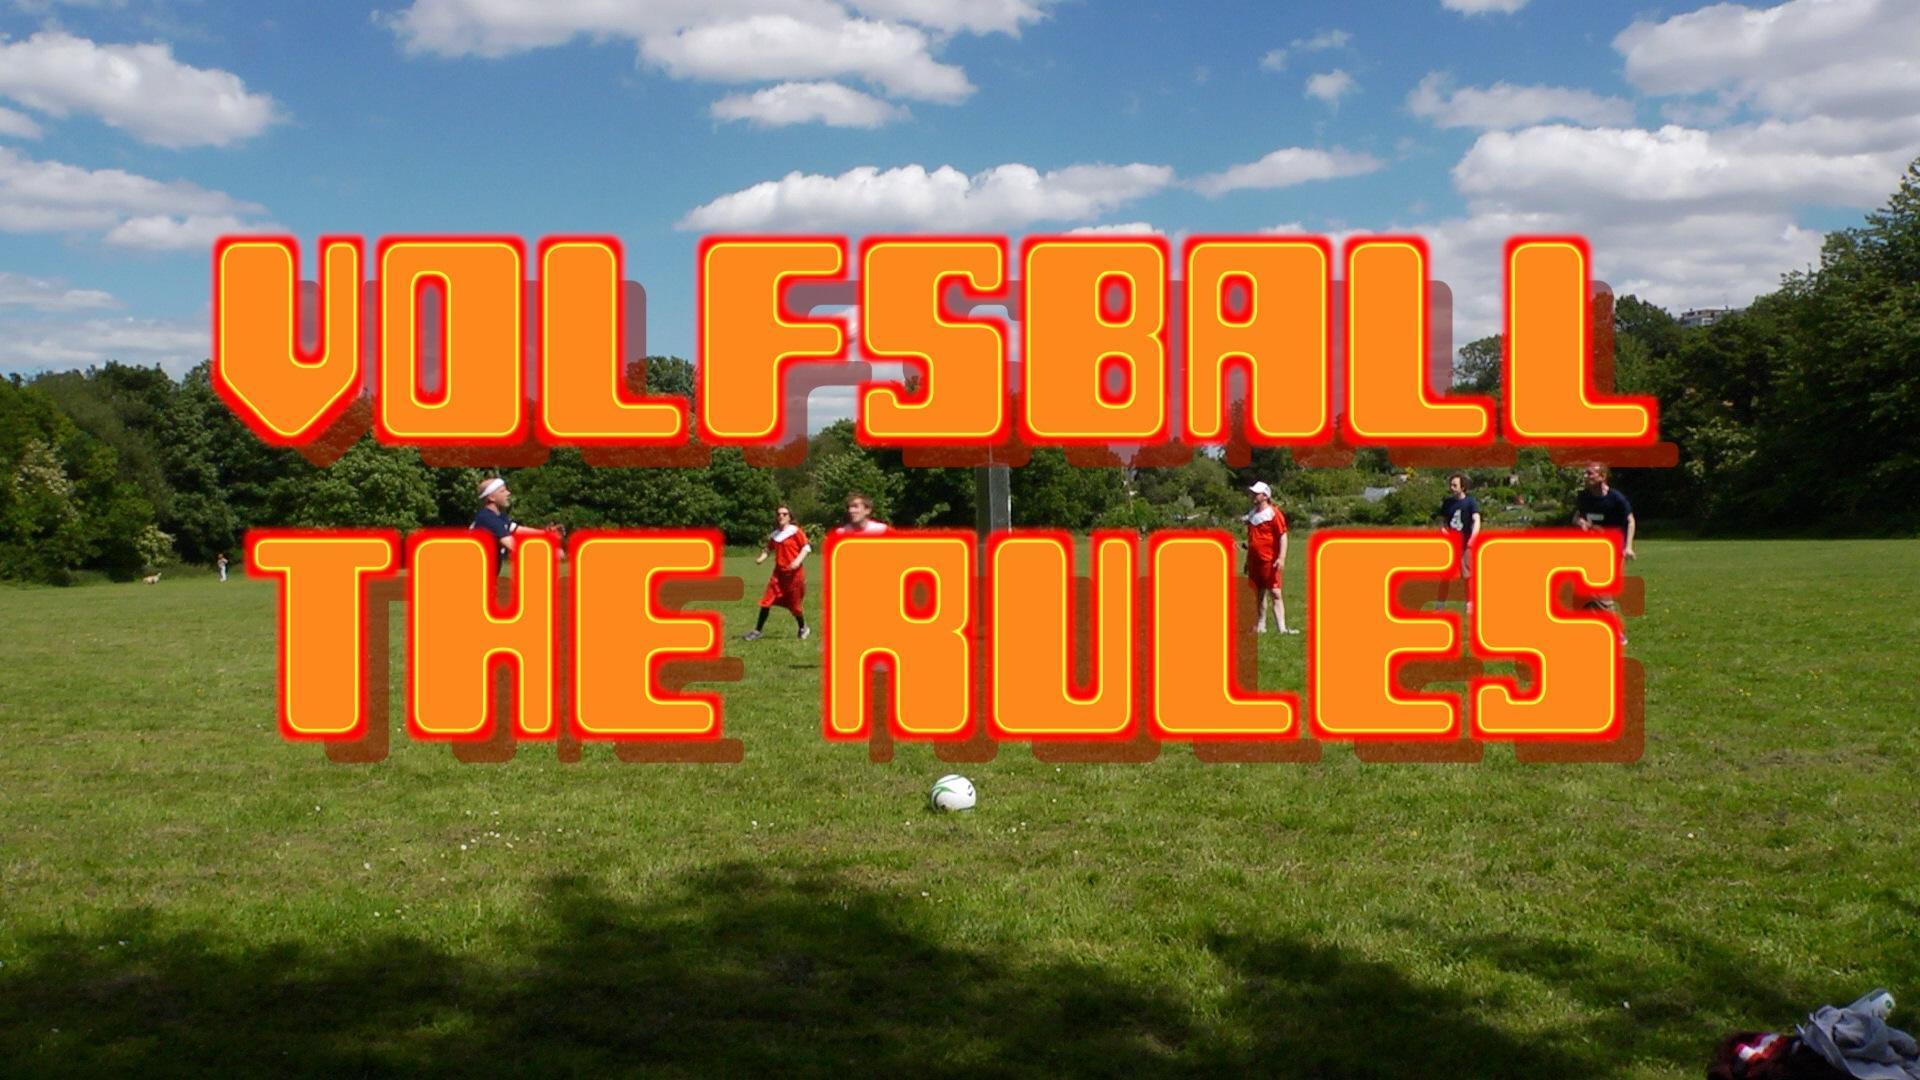 Volfsball Rules Photo